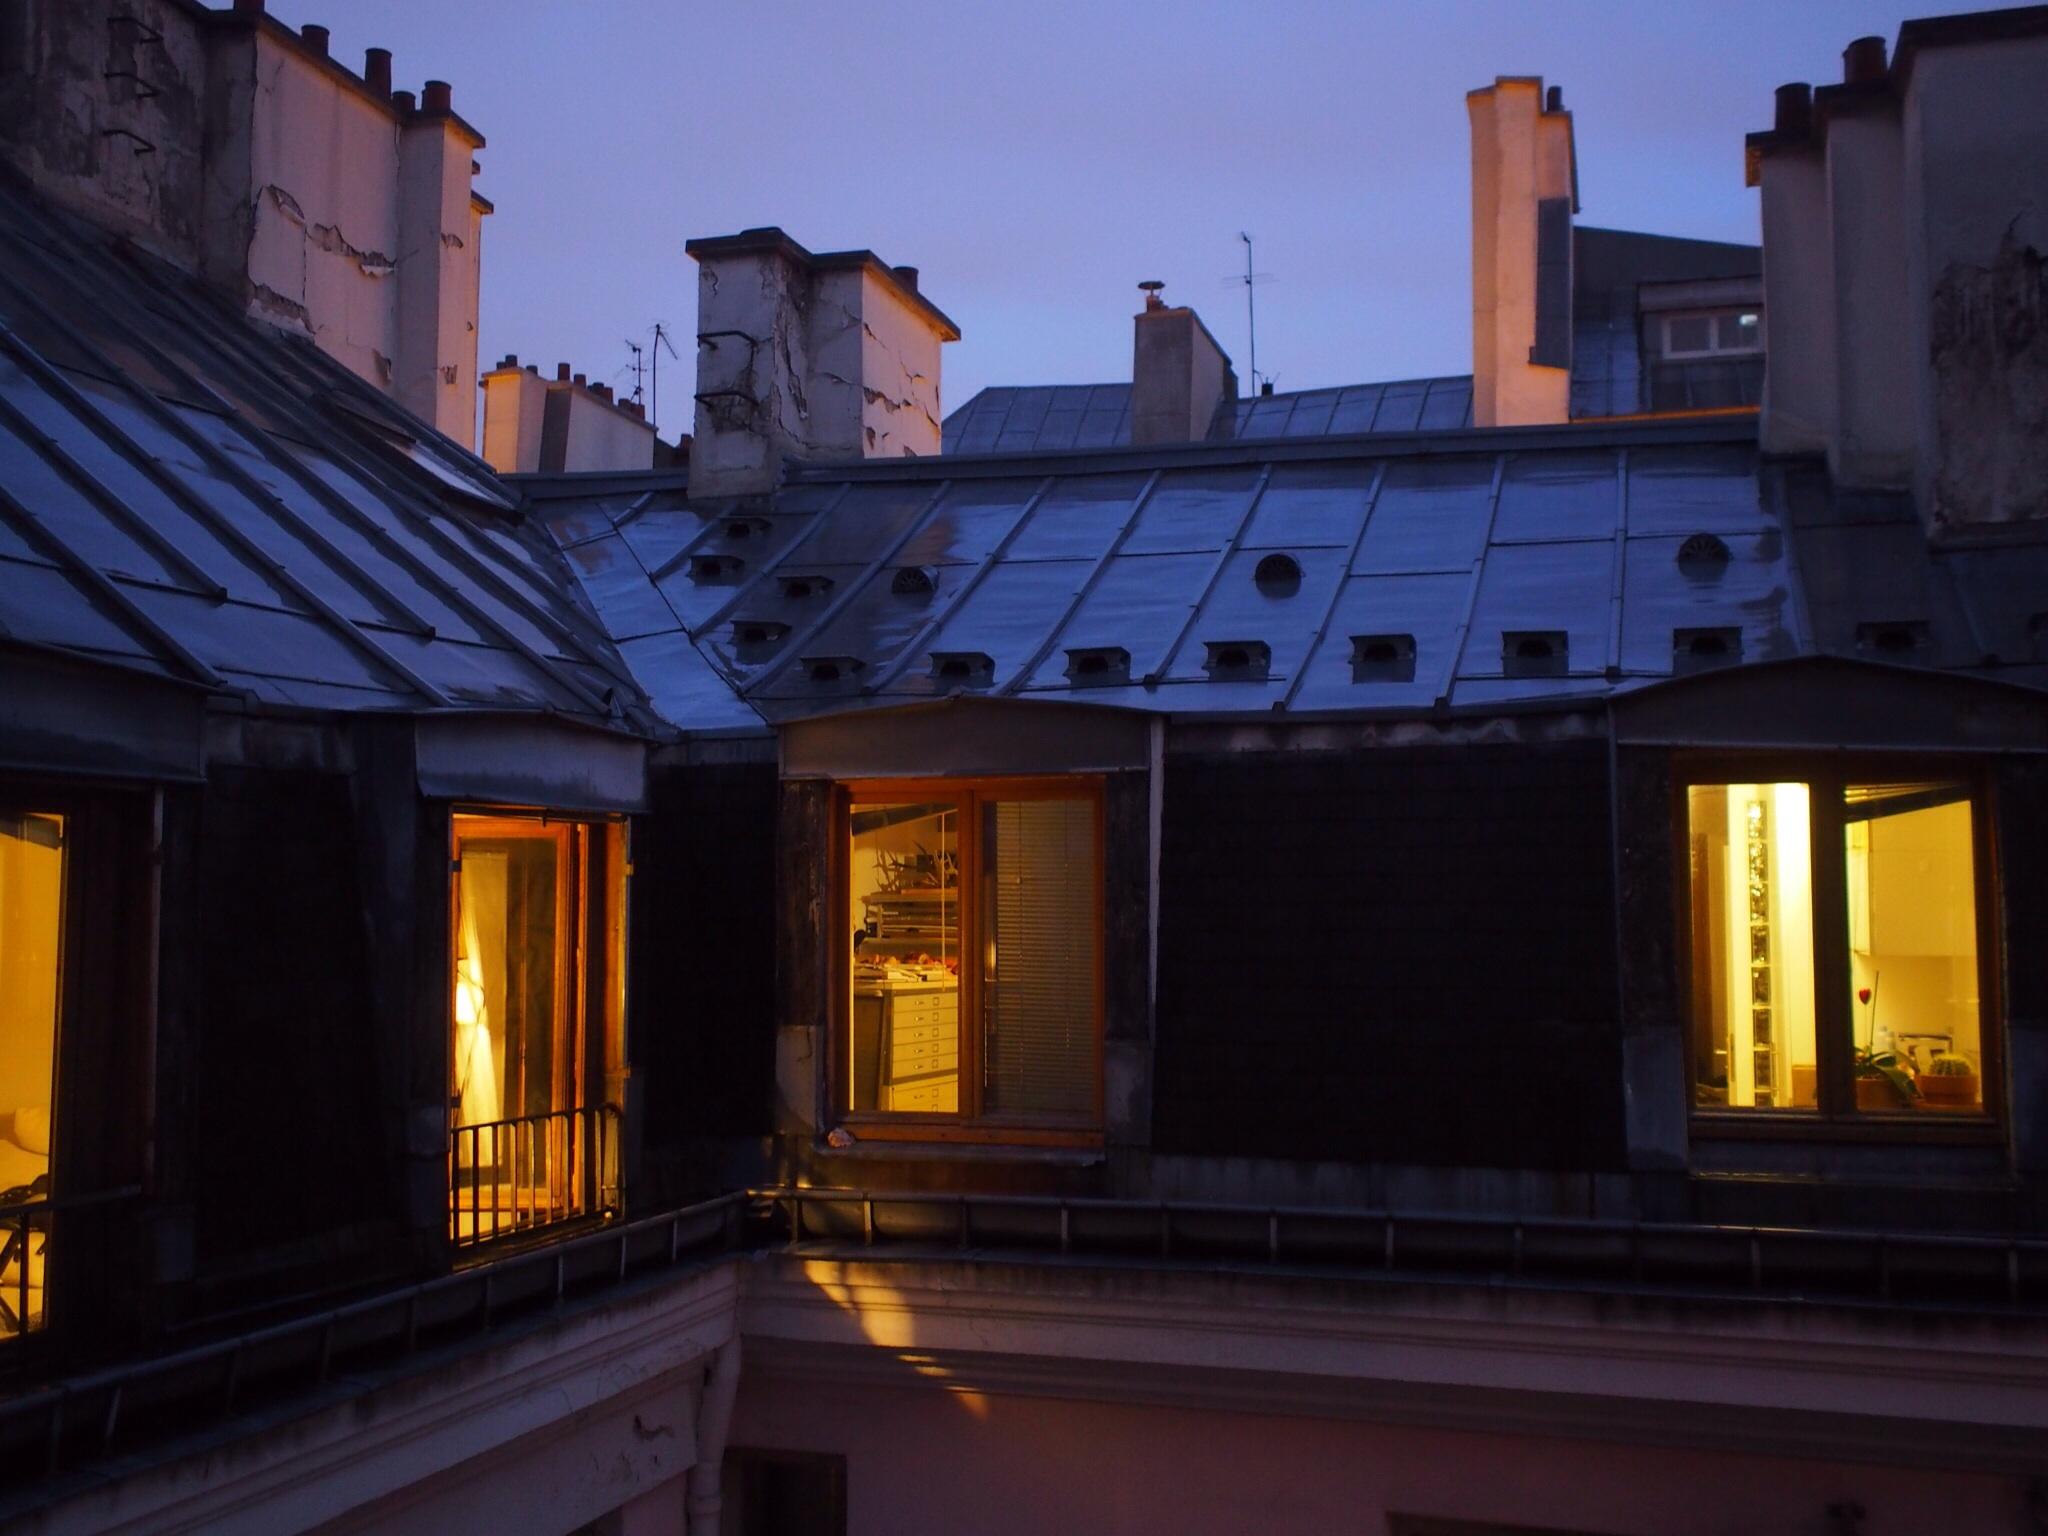 My Parisian abode, simply gorgeous!!